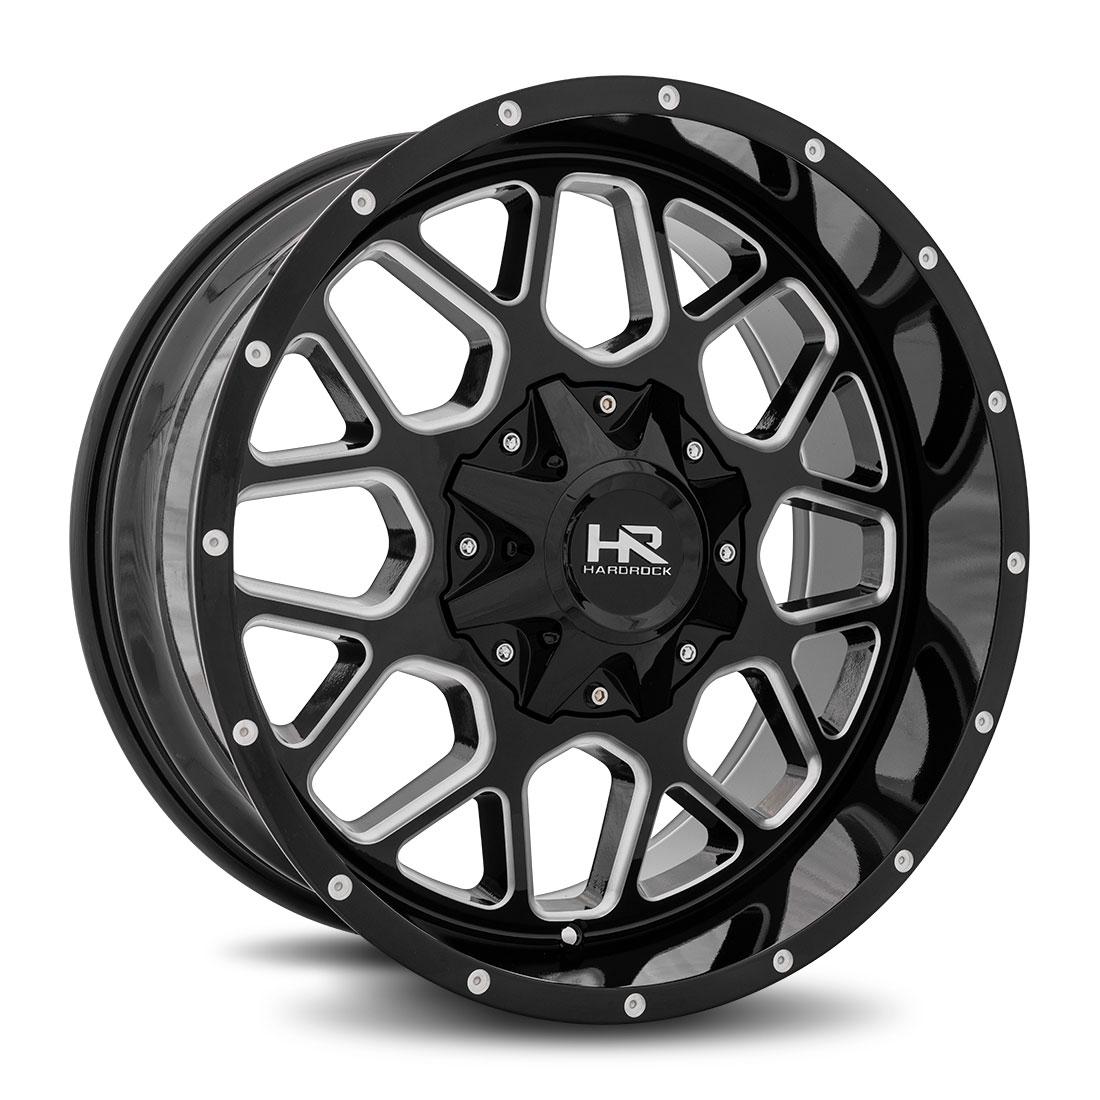 Hardrock Offroad Wheels H705 Gunner - Gloss Black Milled - 20x9